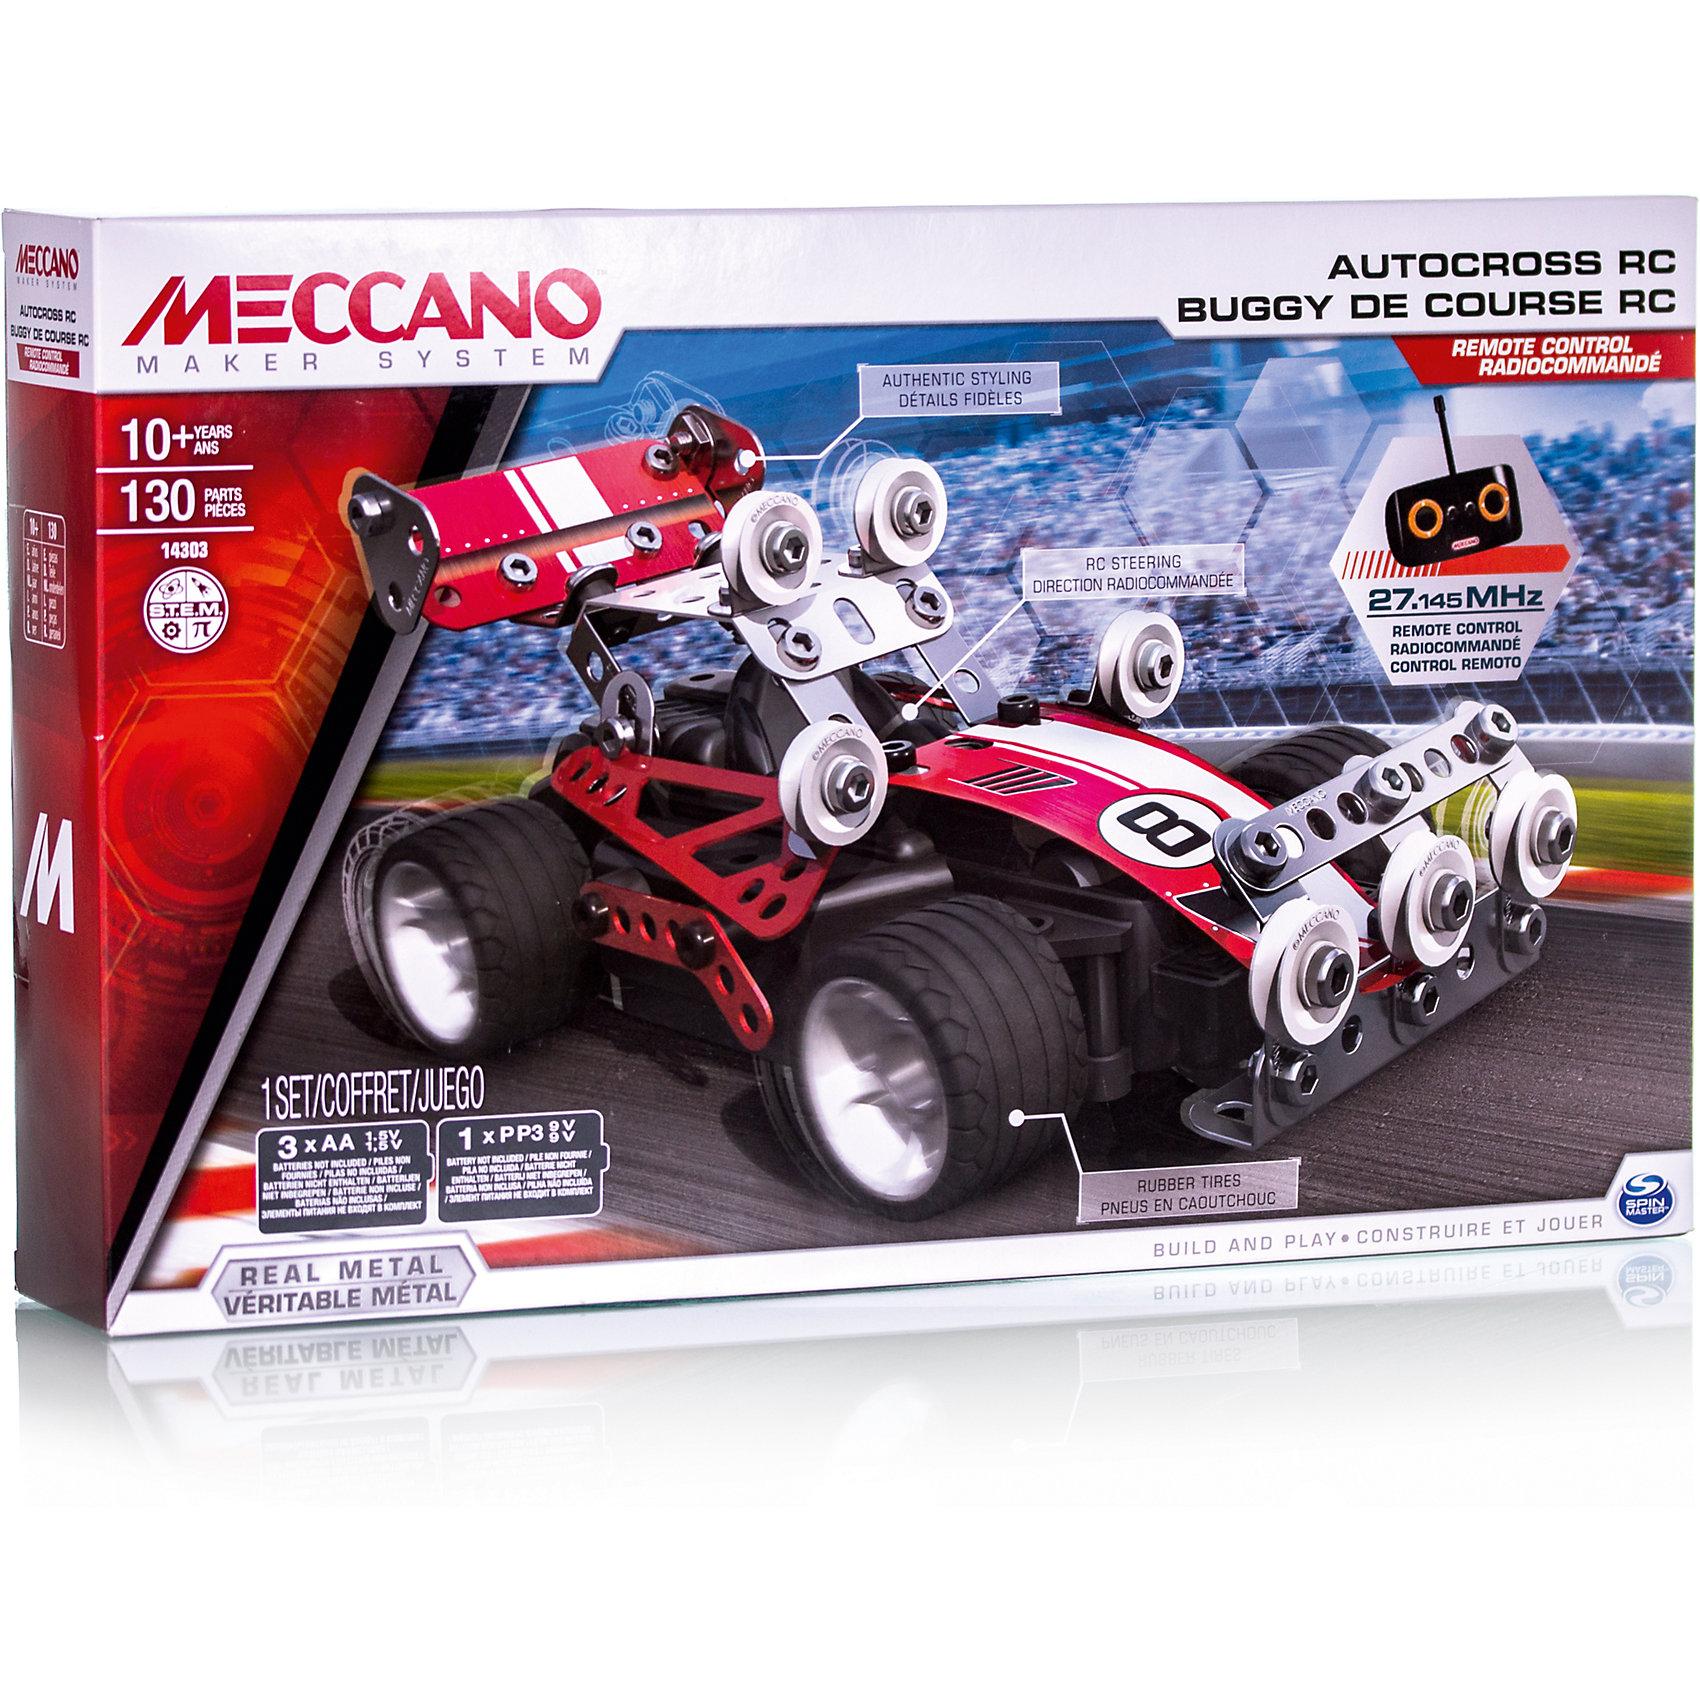 Meccano Гоночная машина (2 модели), на радиоуправлении, Meccano meccano эйфелева башня 2 модели meccano